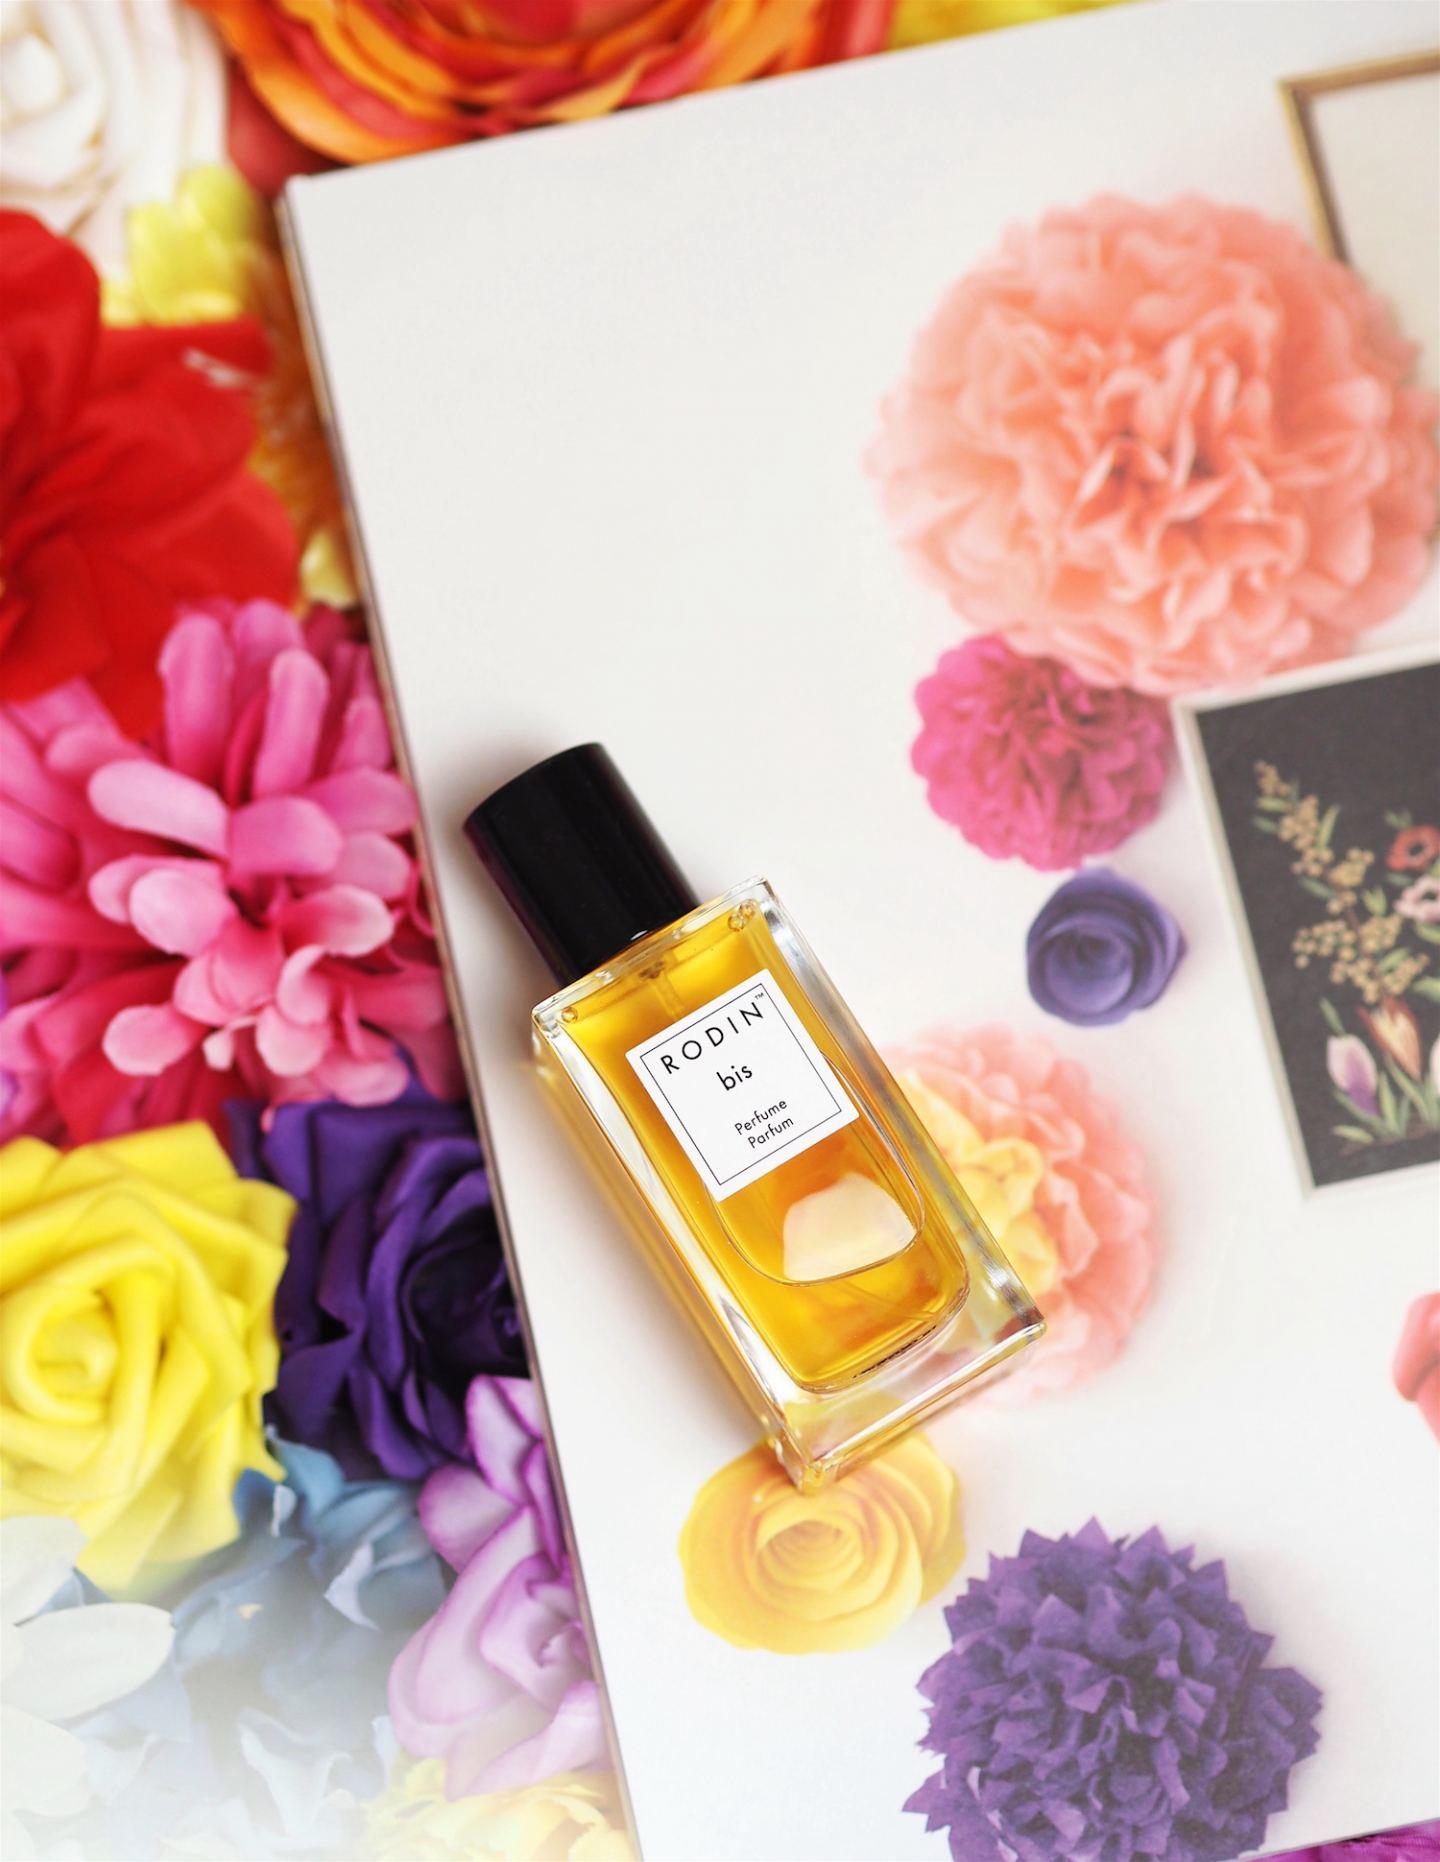 RODIN bis perfume fragrance